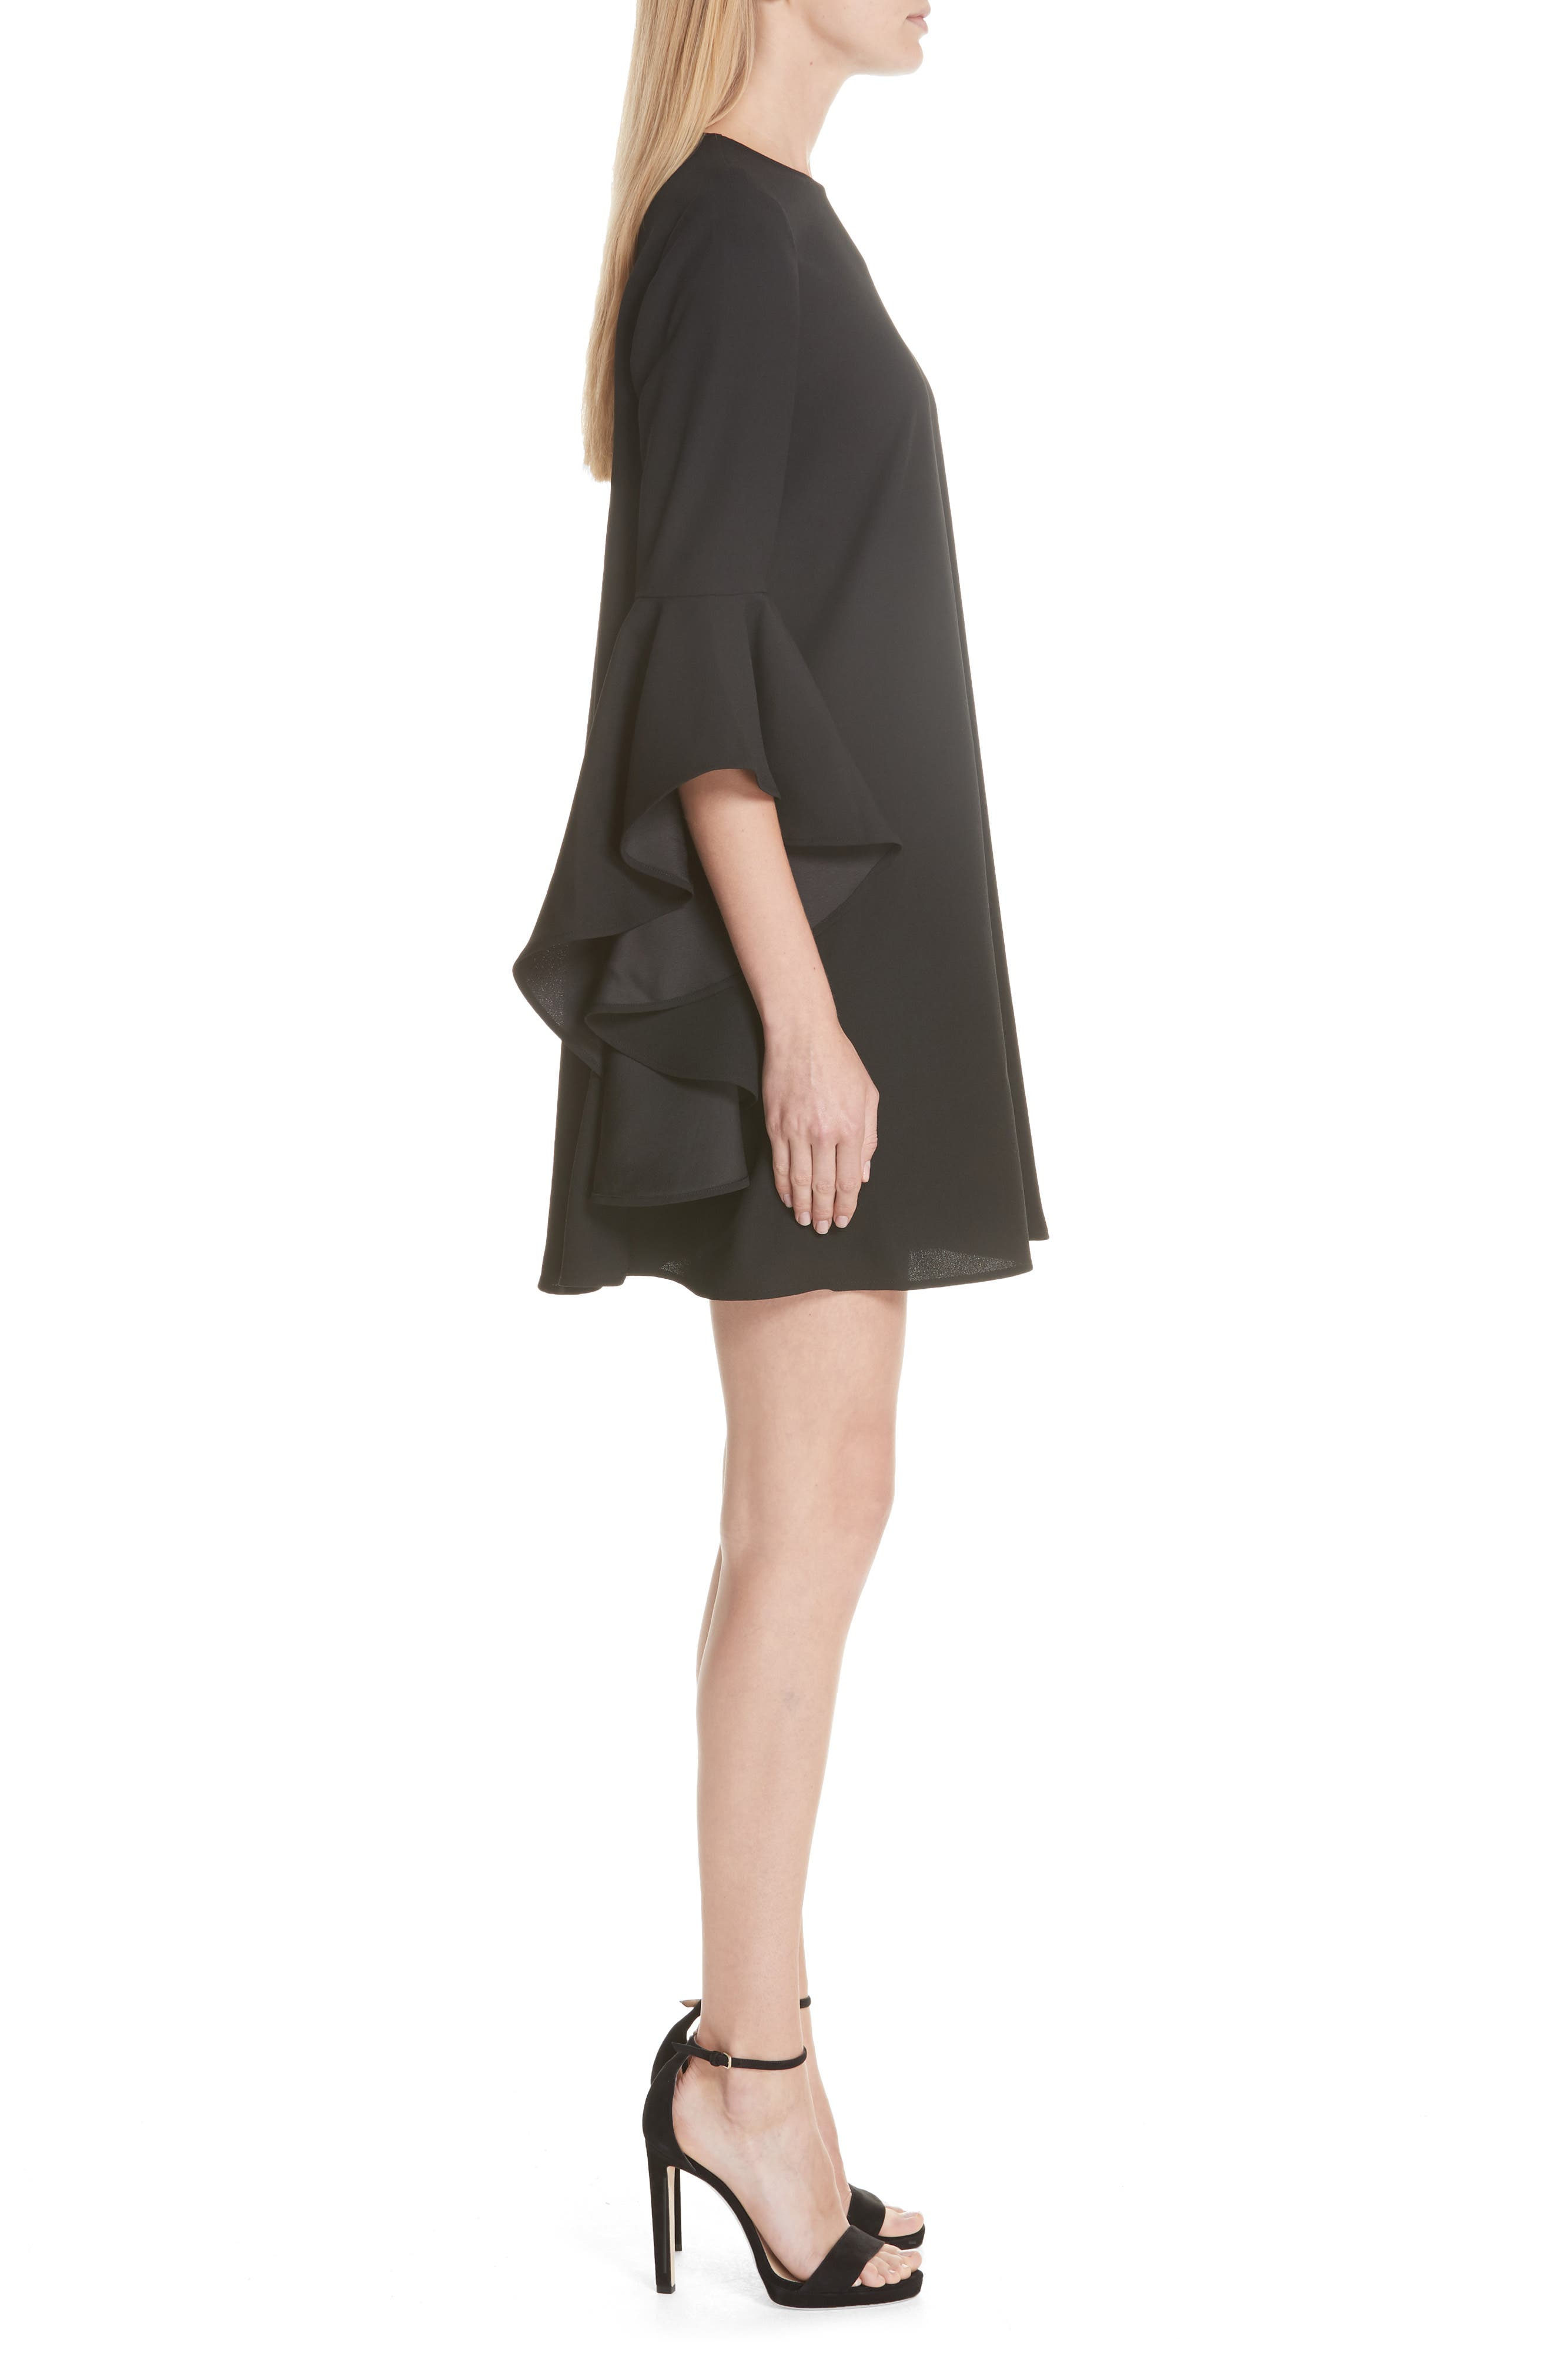 TED BAKER LONDON,                             Ashley Waterfall Sleeve A-Line Dress,                             Alternate thumbnail 3, color,                             001